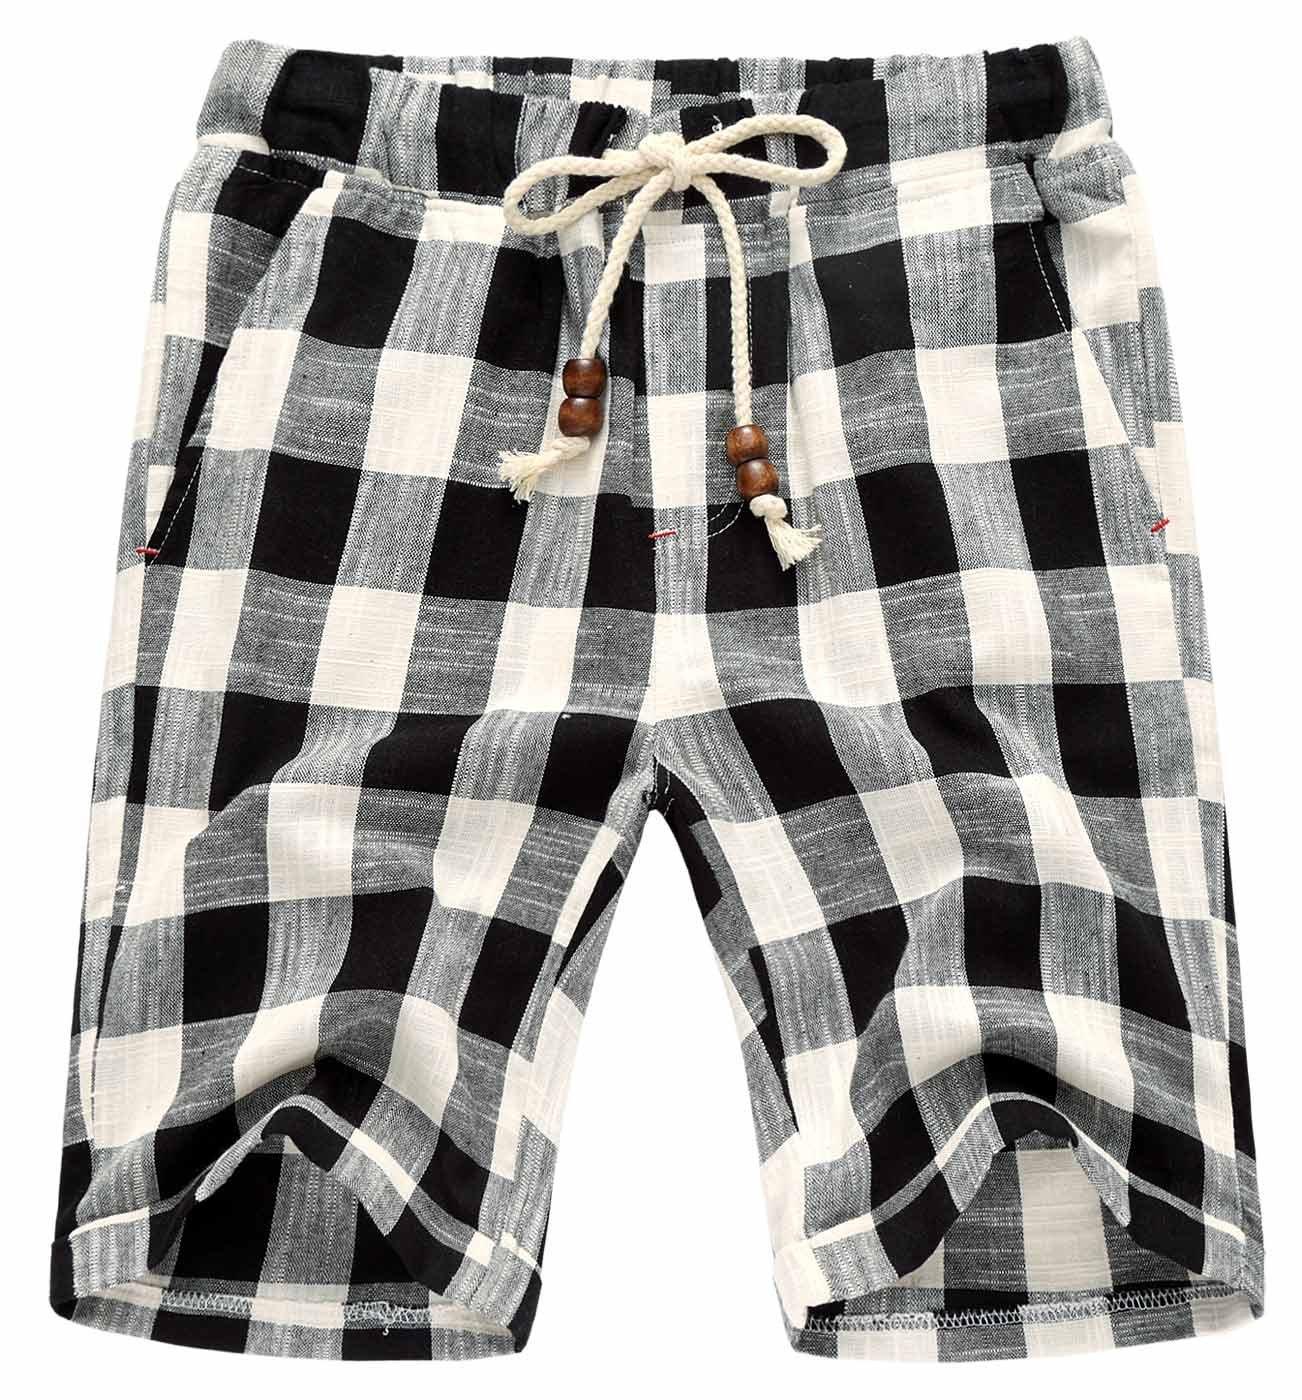 AIEOE Men Quick Dry Shorts Flat Front Summer Beach Swimming Shorts Drawstring Durable Breathable Soft Retro 36 Plaid Black